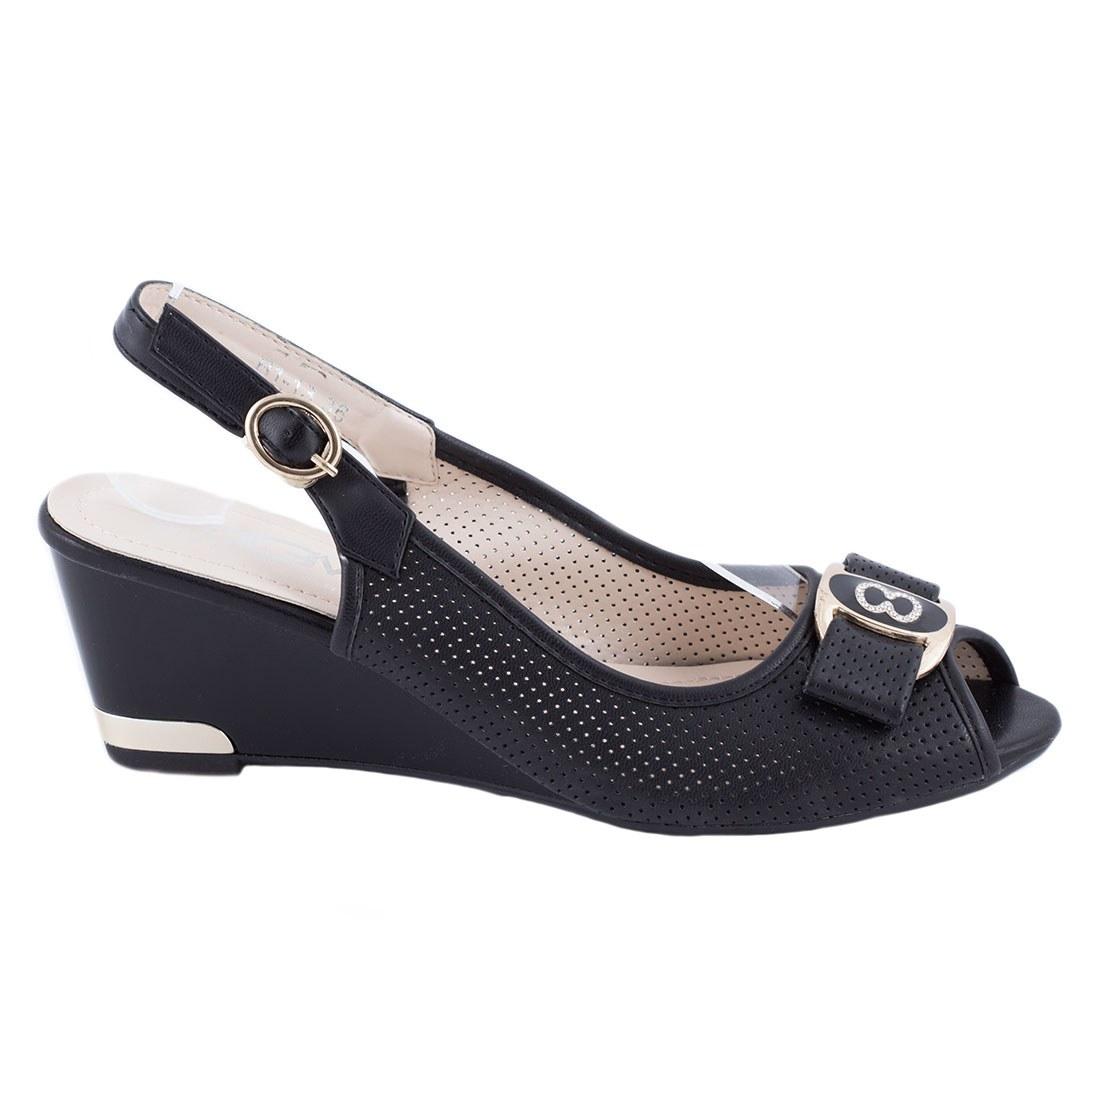 Sandale de dama cu talpa ortopedica B1-13-NEGRU